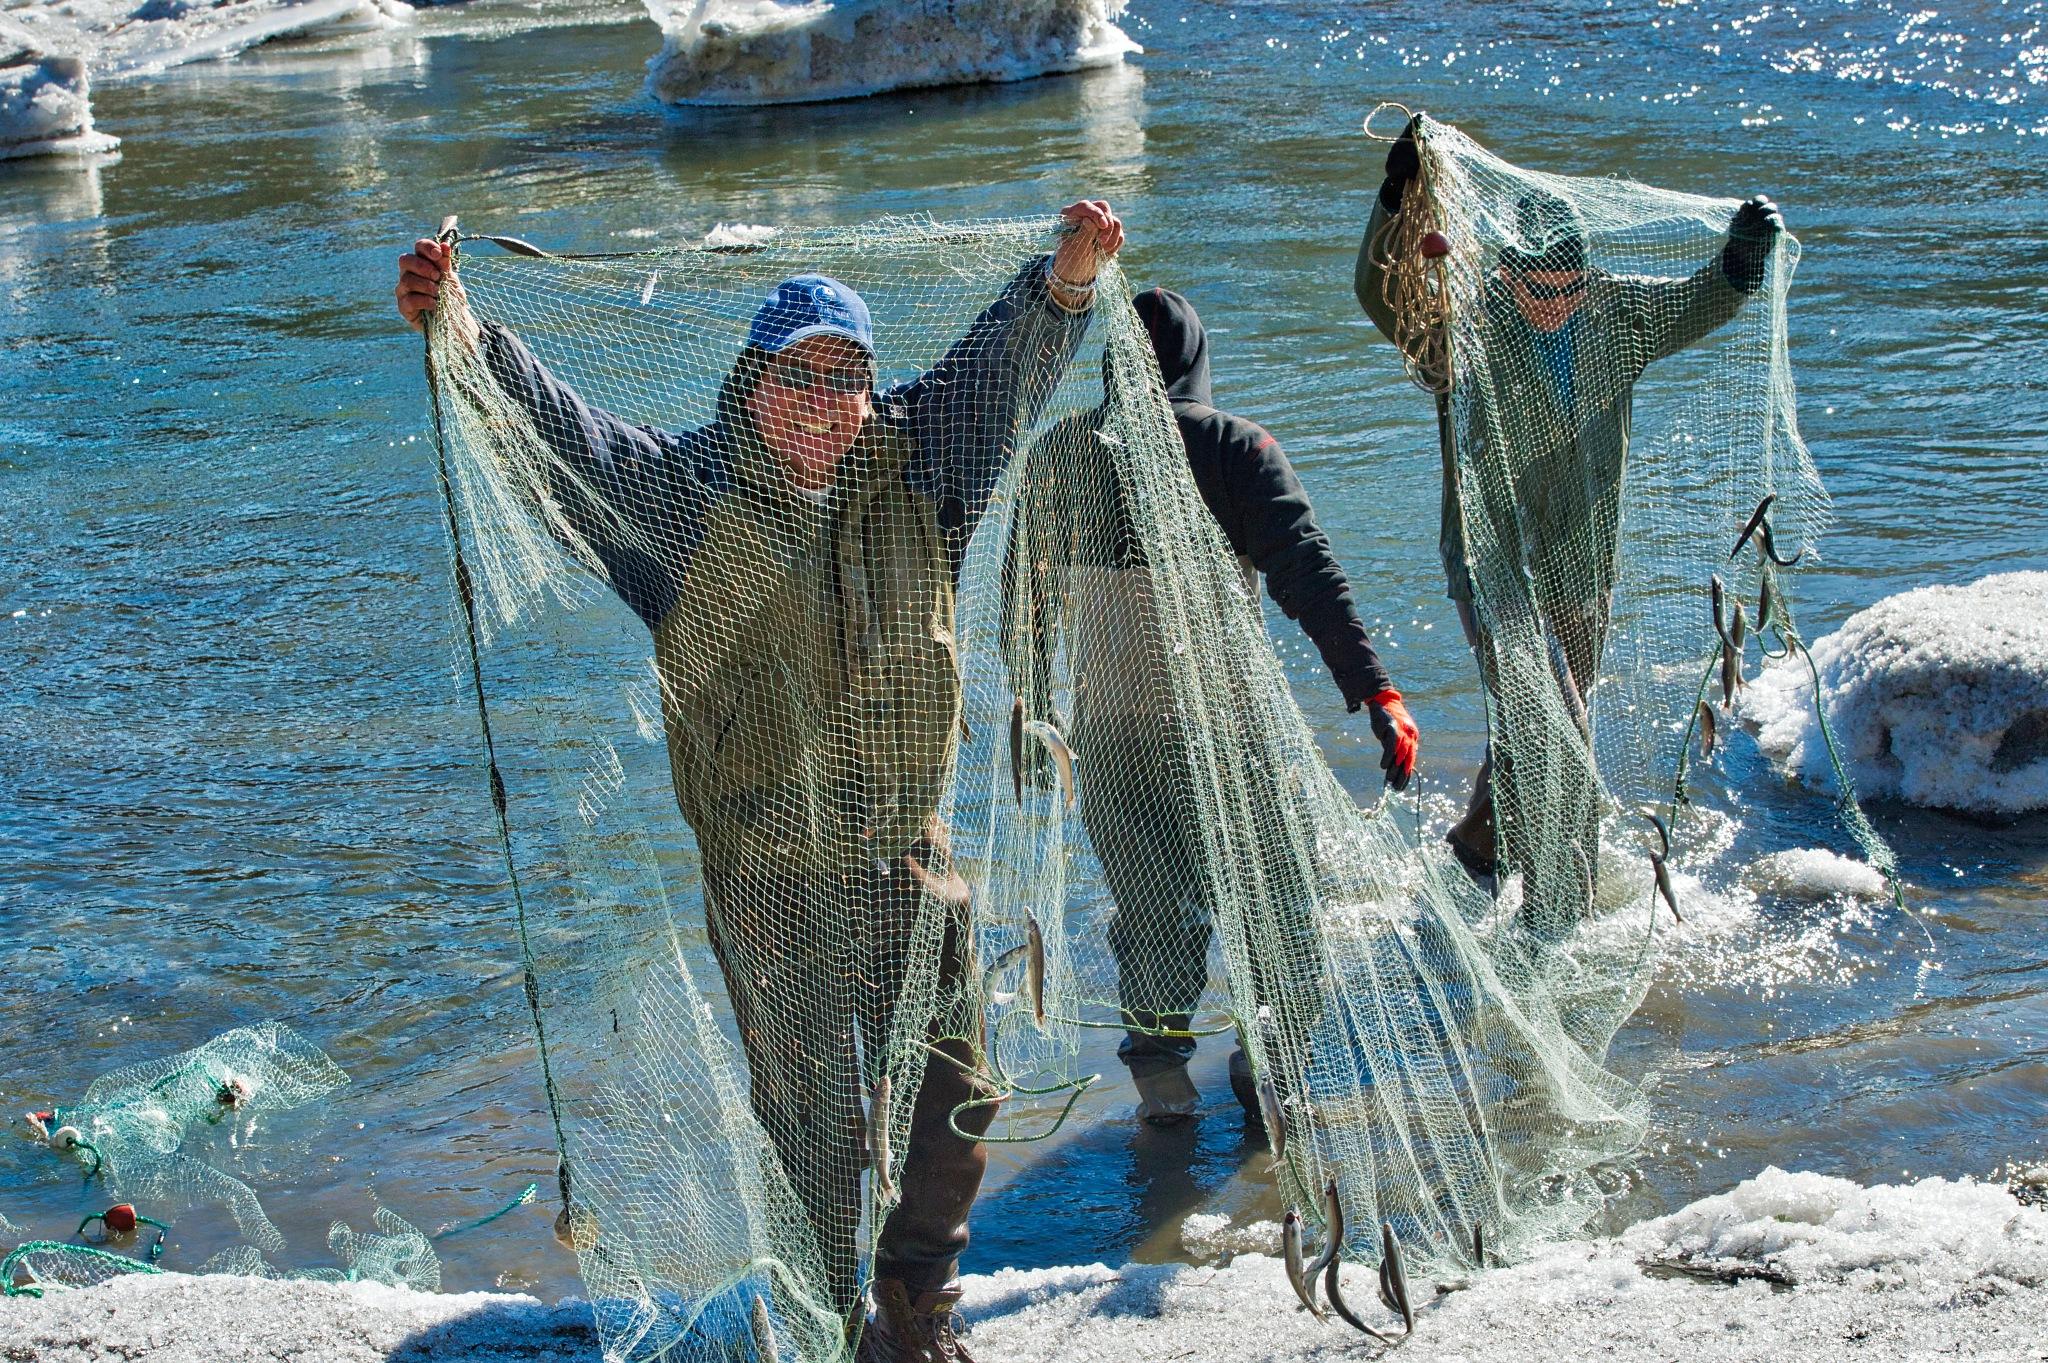 fish in the net by Evan Spellman